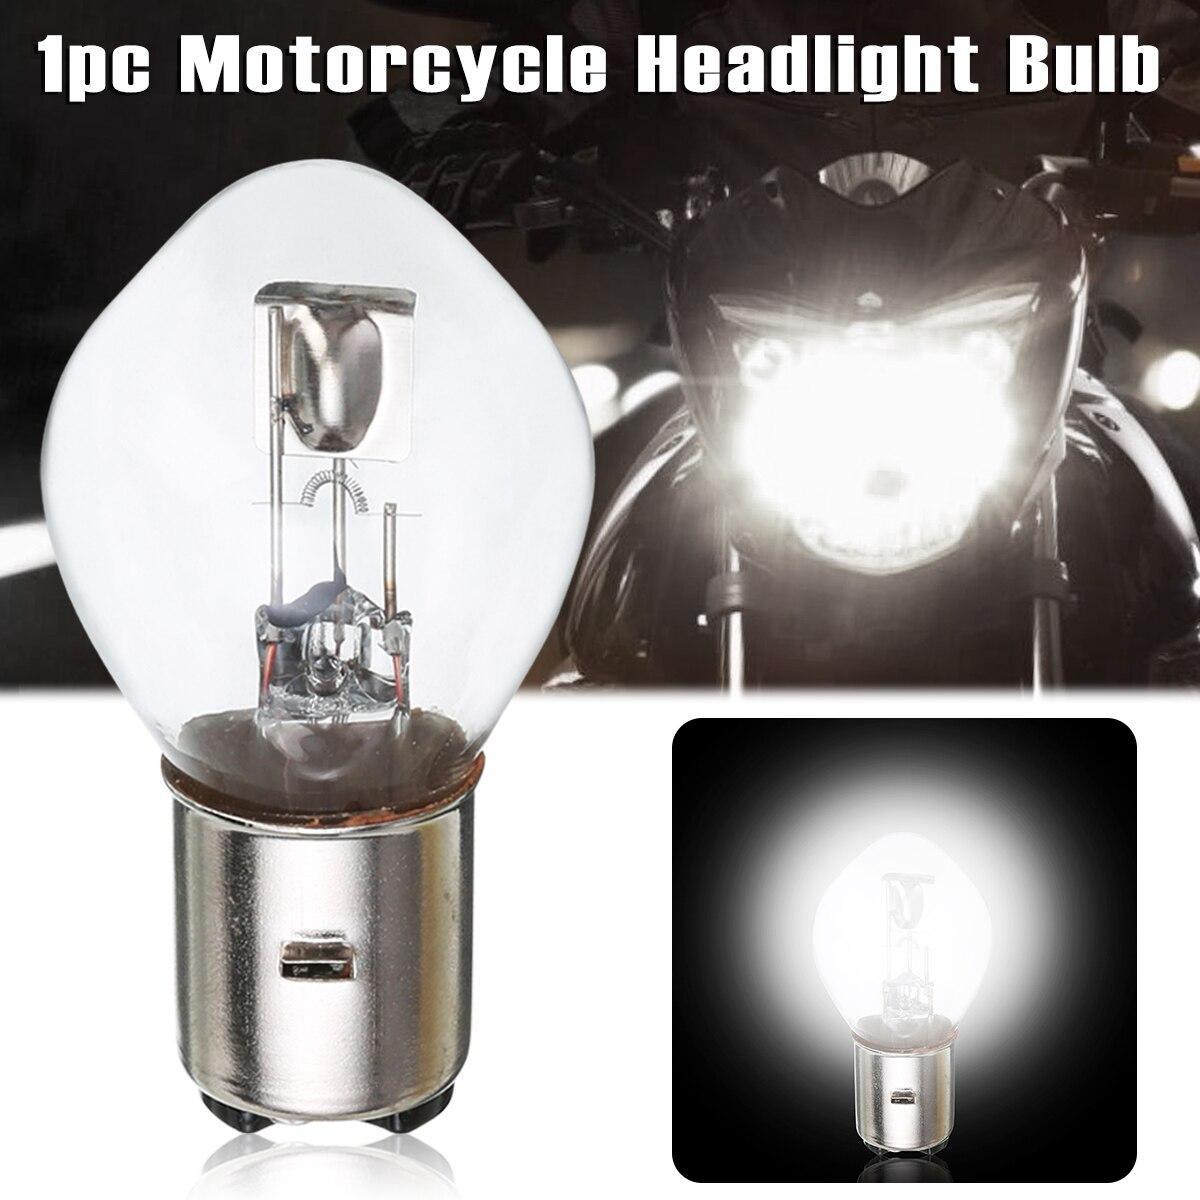 1 Pc 12 V 35 W 10a Motorrad Atv Moped Roller Scheinwerfer Birne B35 Ba20d Kopf Lampe Quarz Kupfer Draht Integrierte Glas